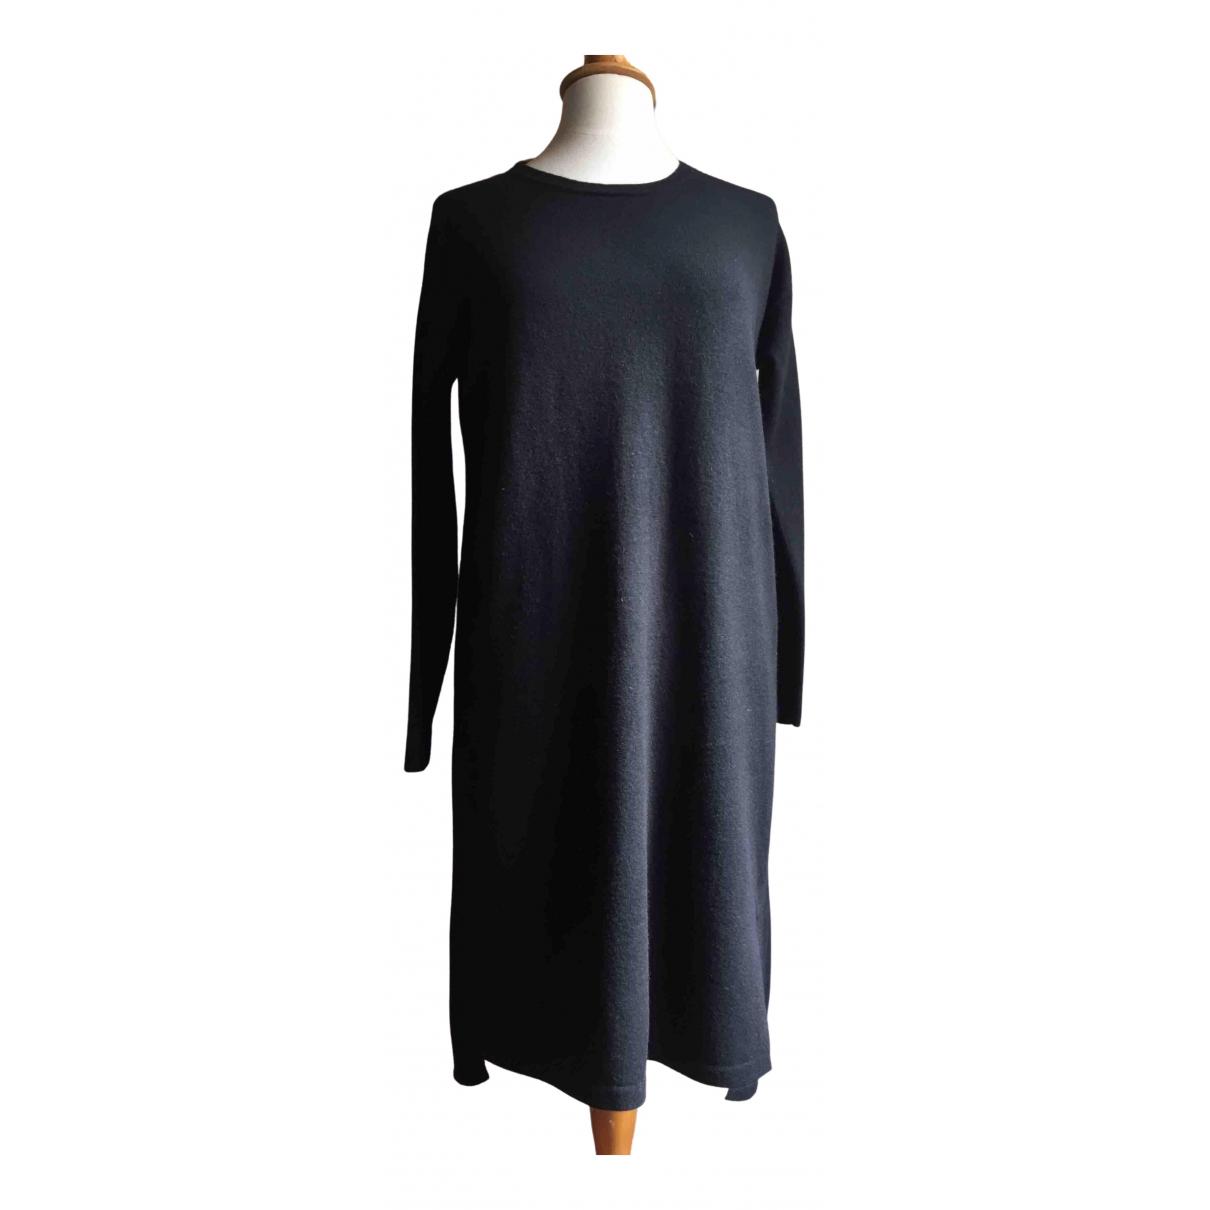 Allude \N Kleid in  Schwarz Wolle